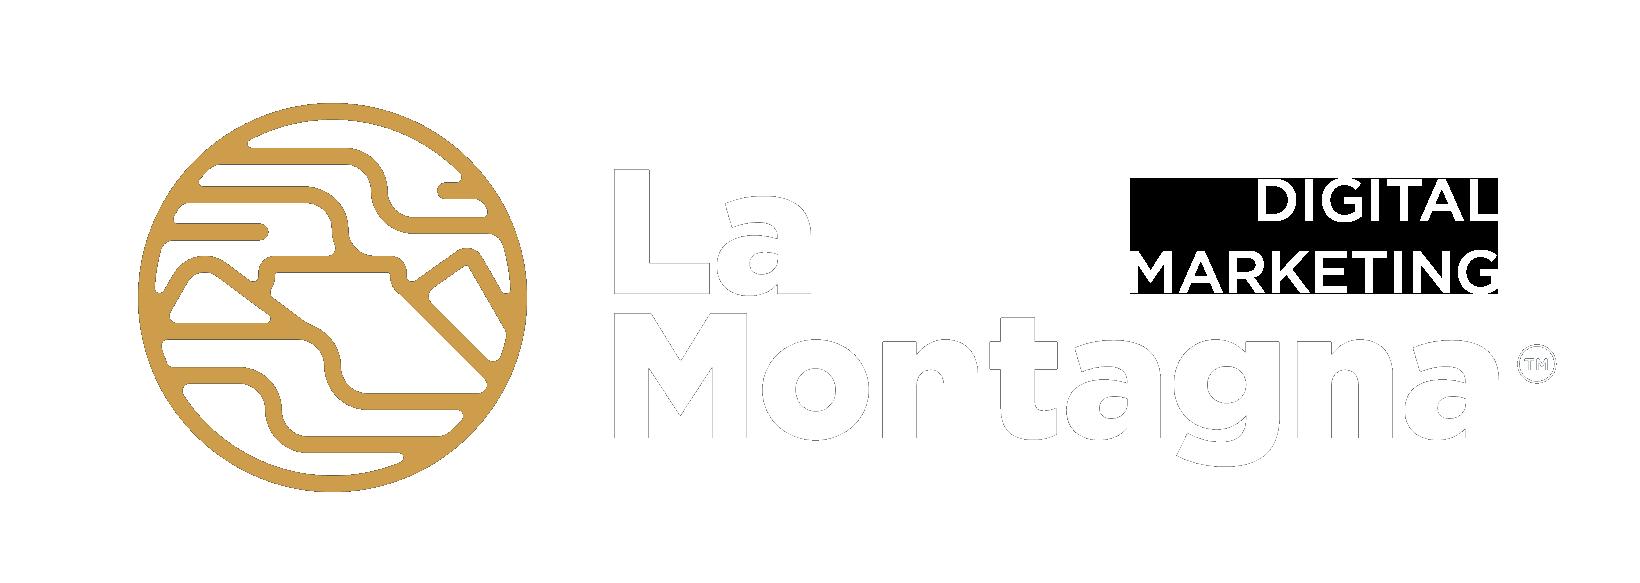 La Montagna - Digital Marketing